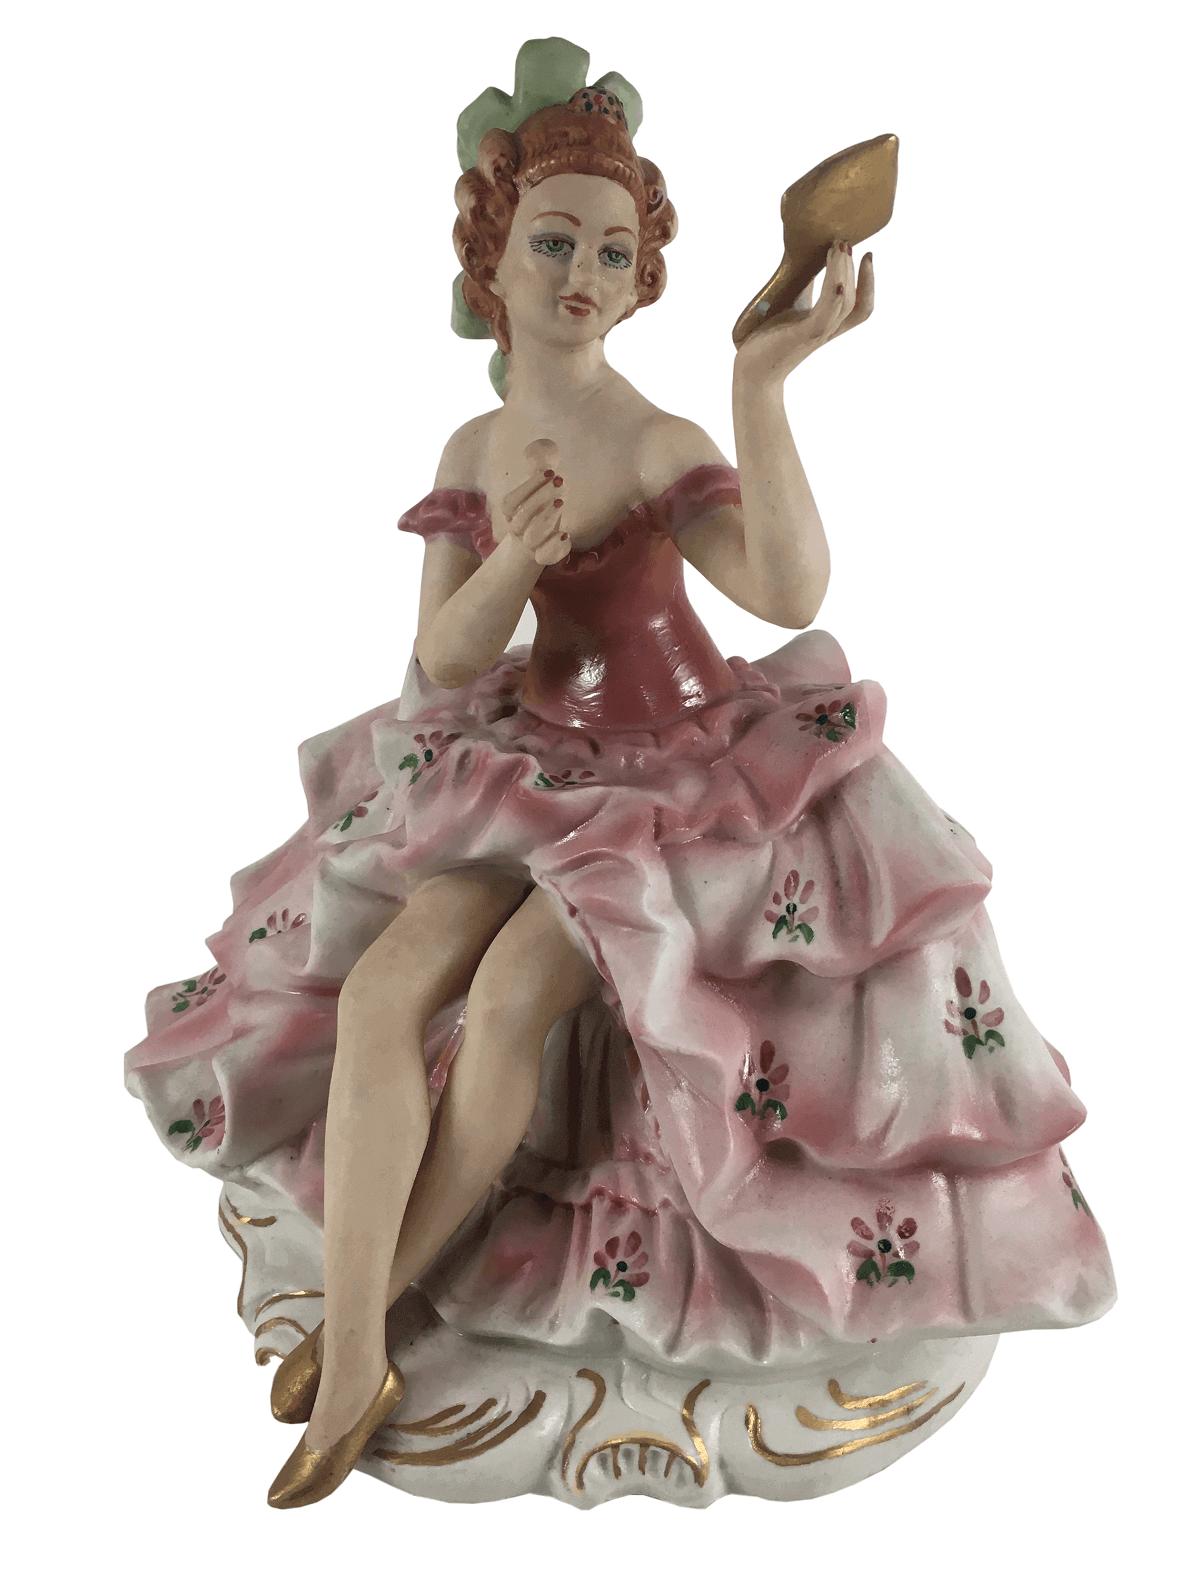 Grande Escultura Antiga Porcelana Dama Se Maquiando